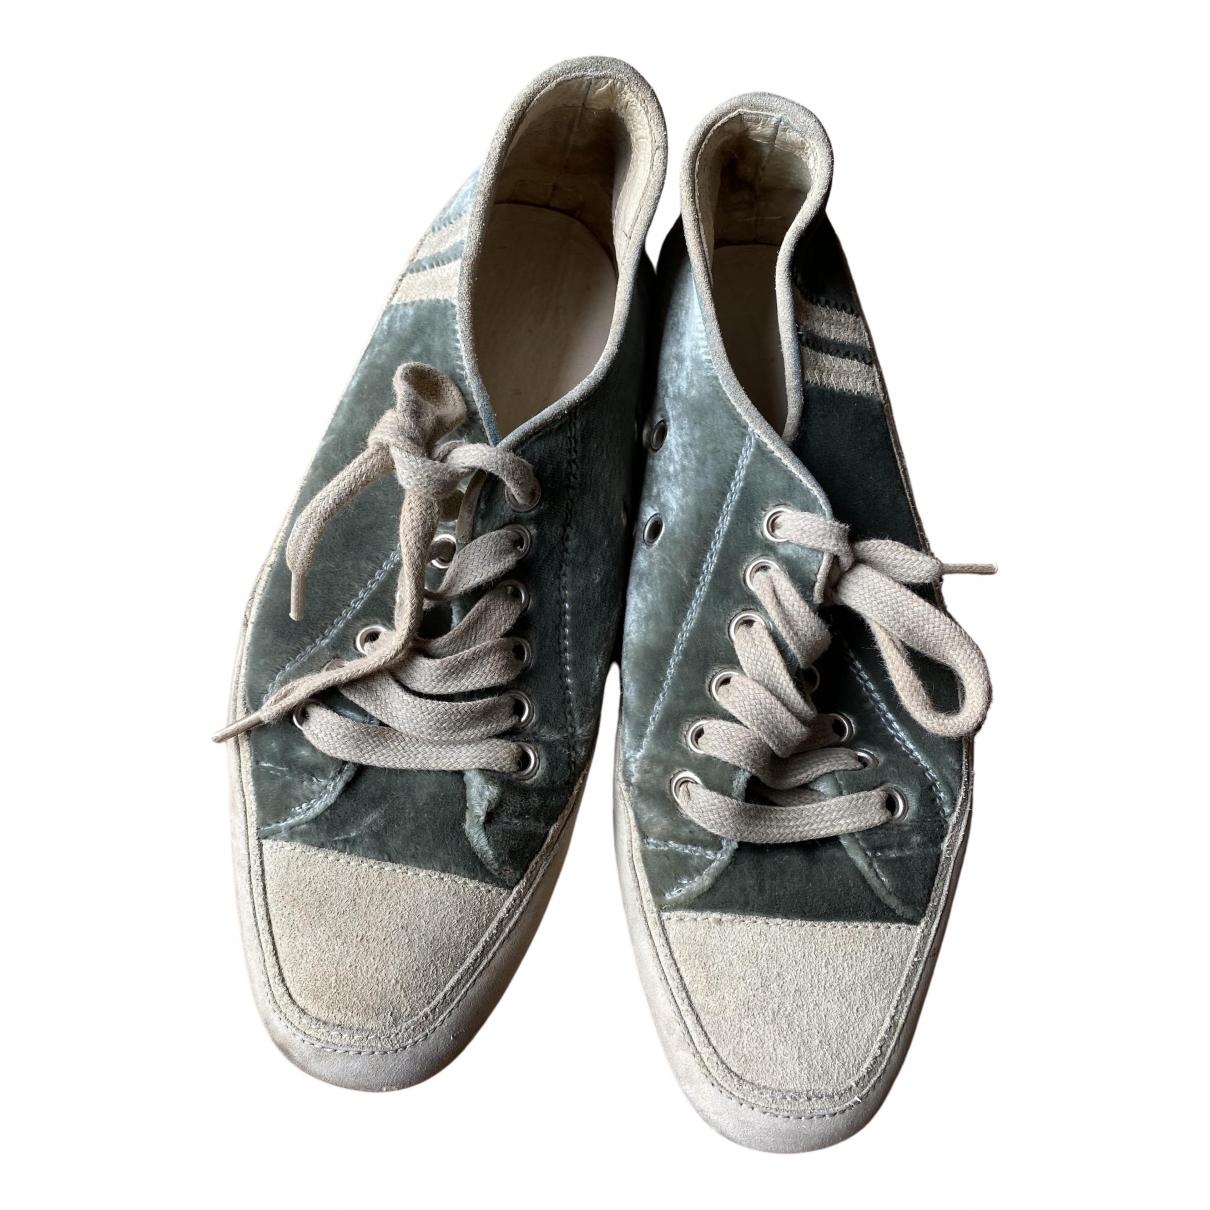 Emma Hope \N Sneakers in  Anthrazit Samt